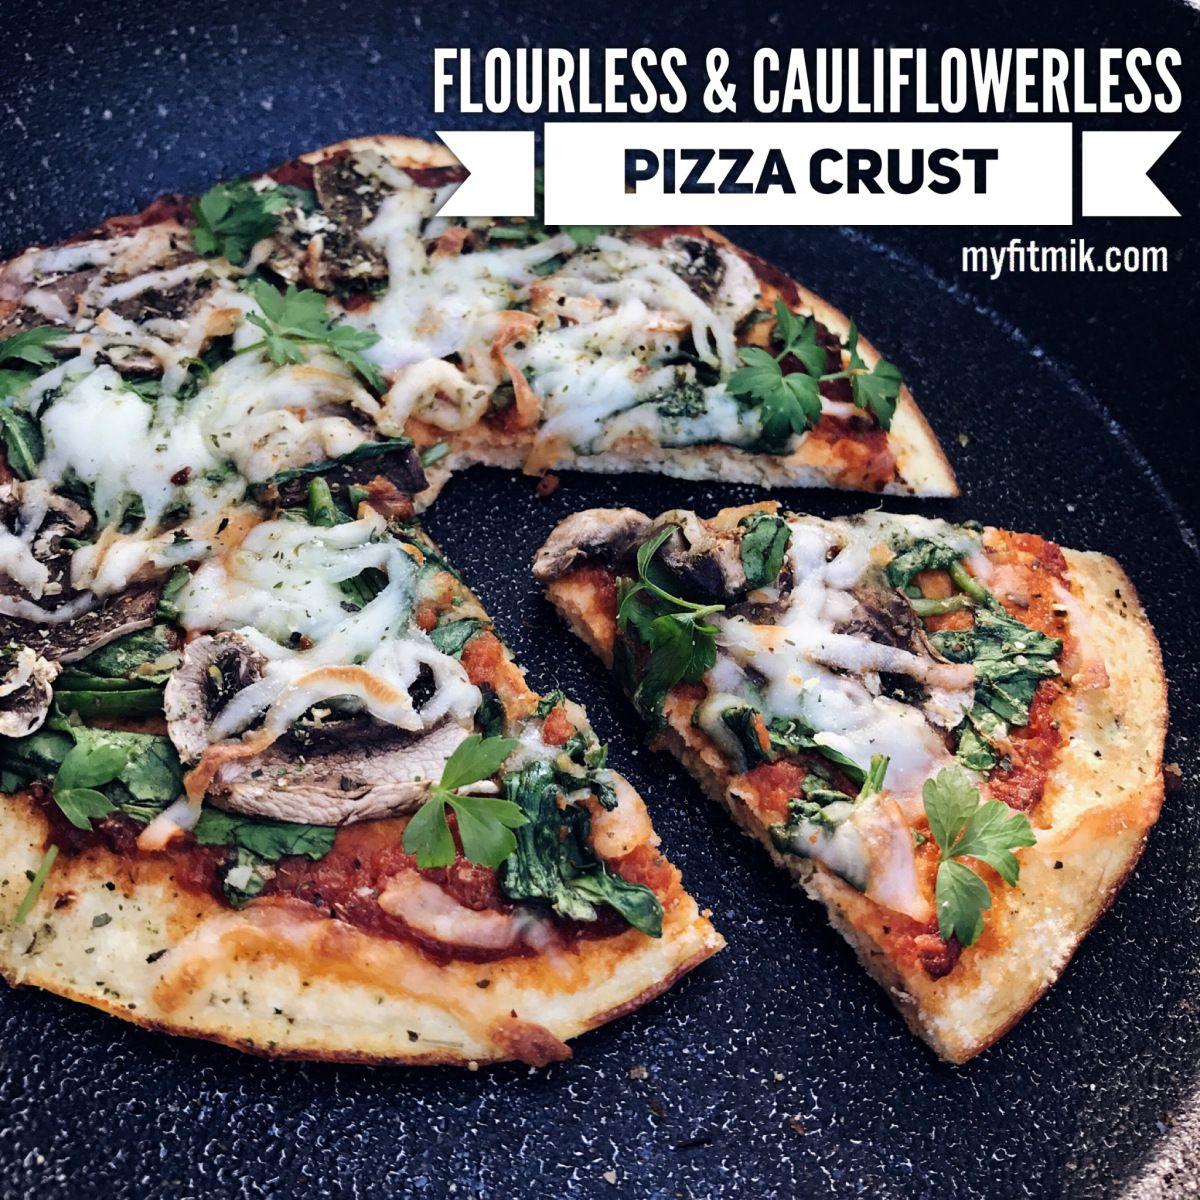 PALEO PIZZA CRUST (NO CAULI OR FLOUR)